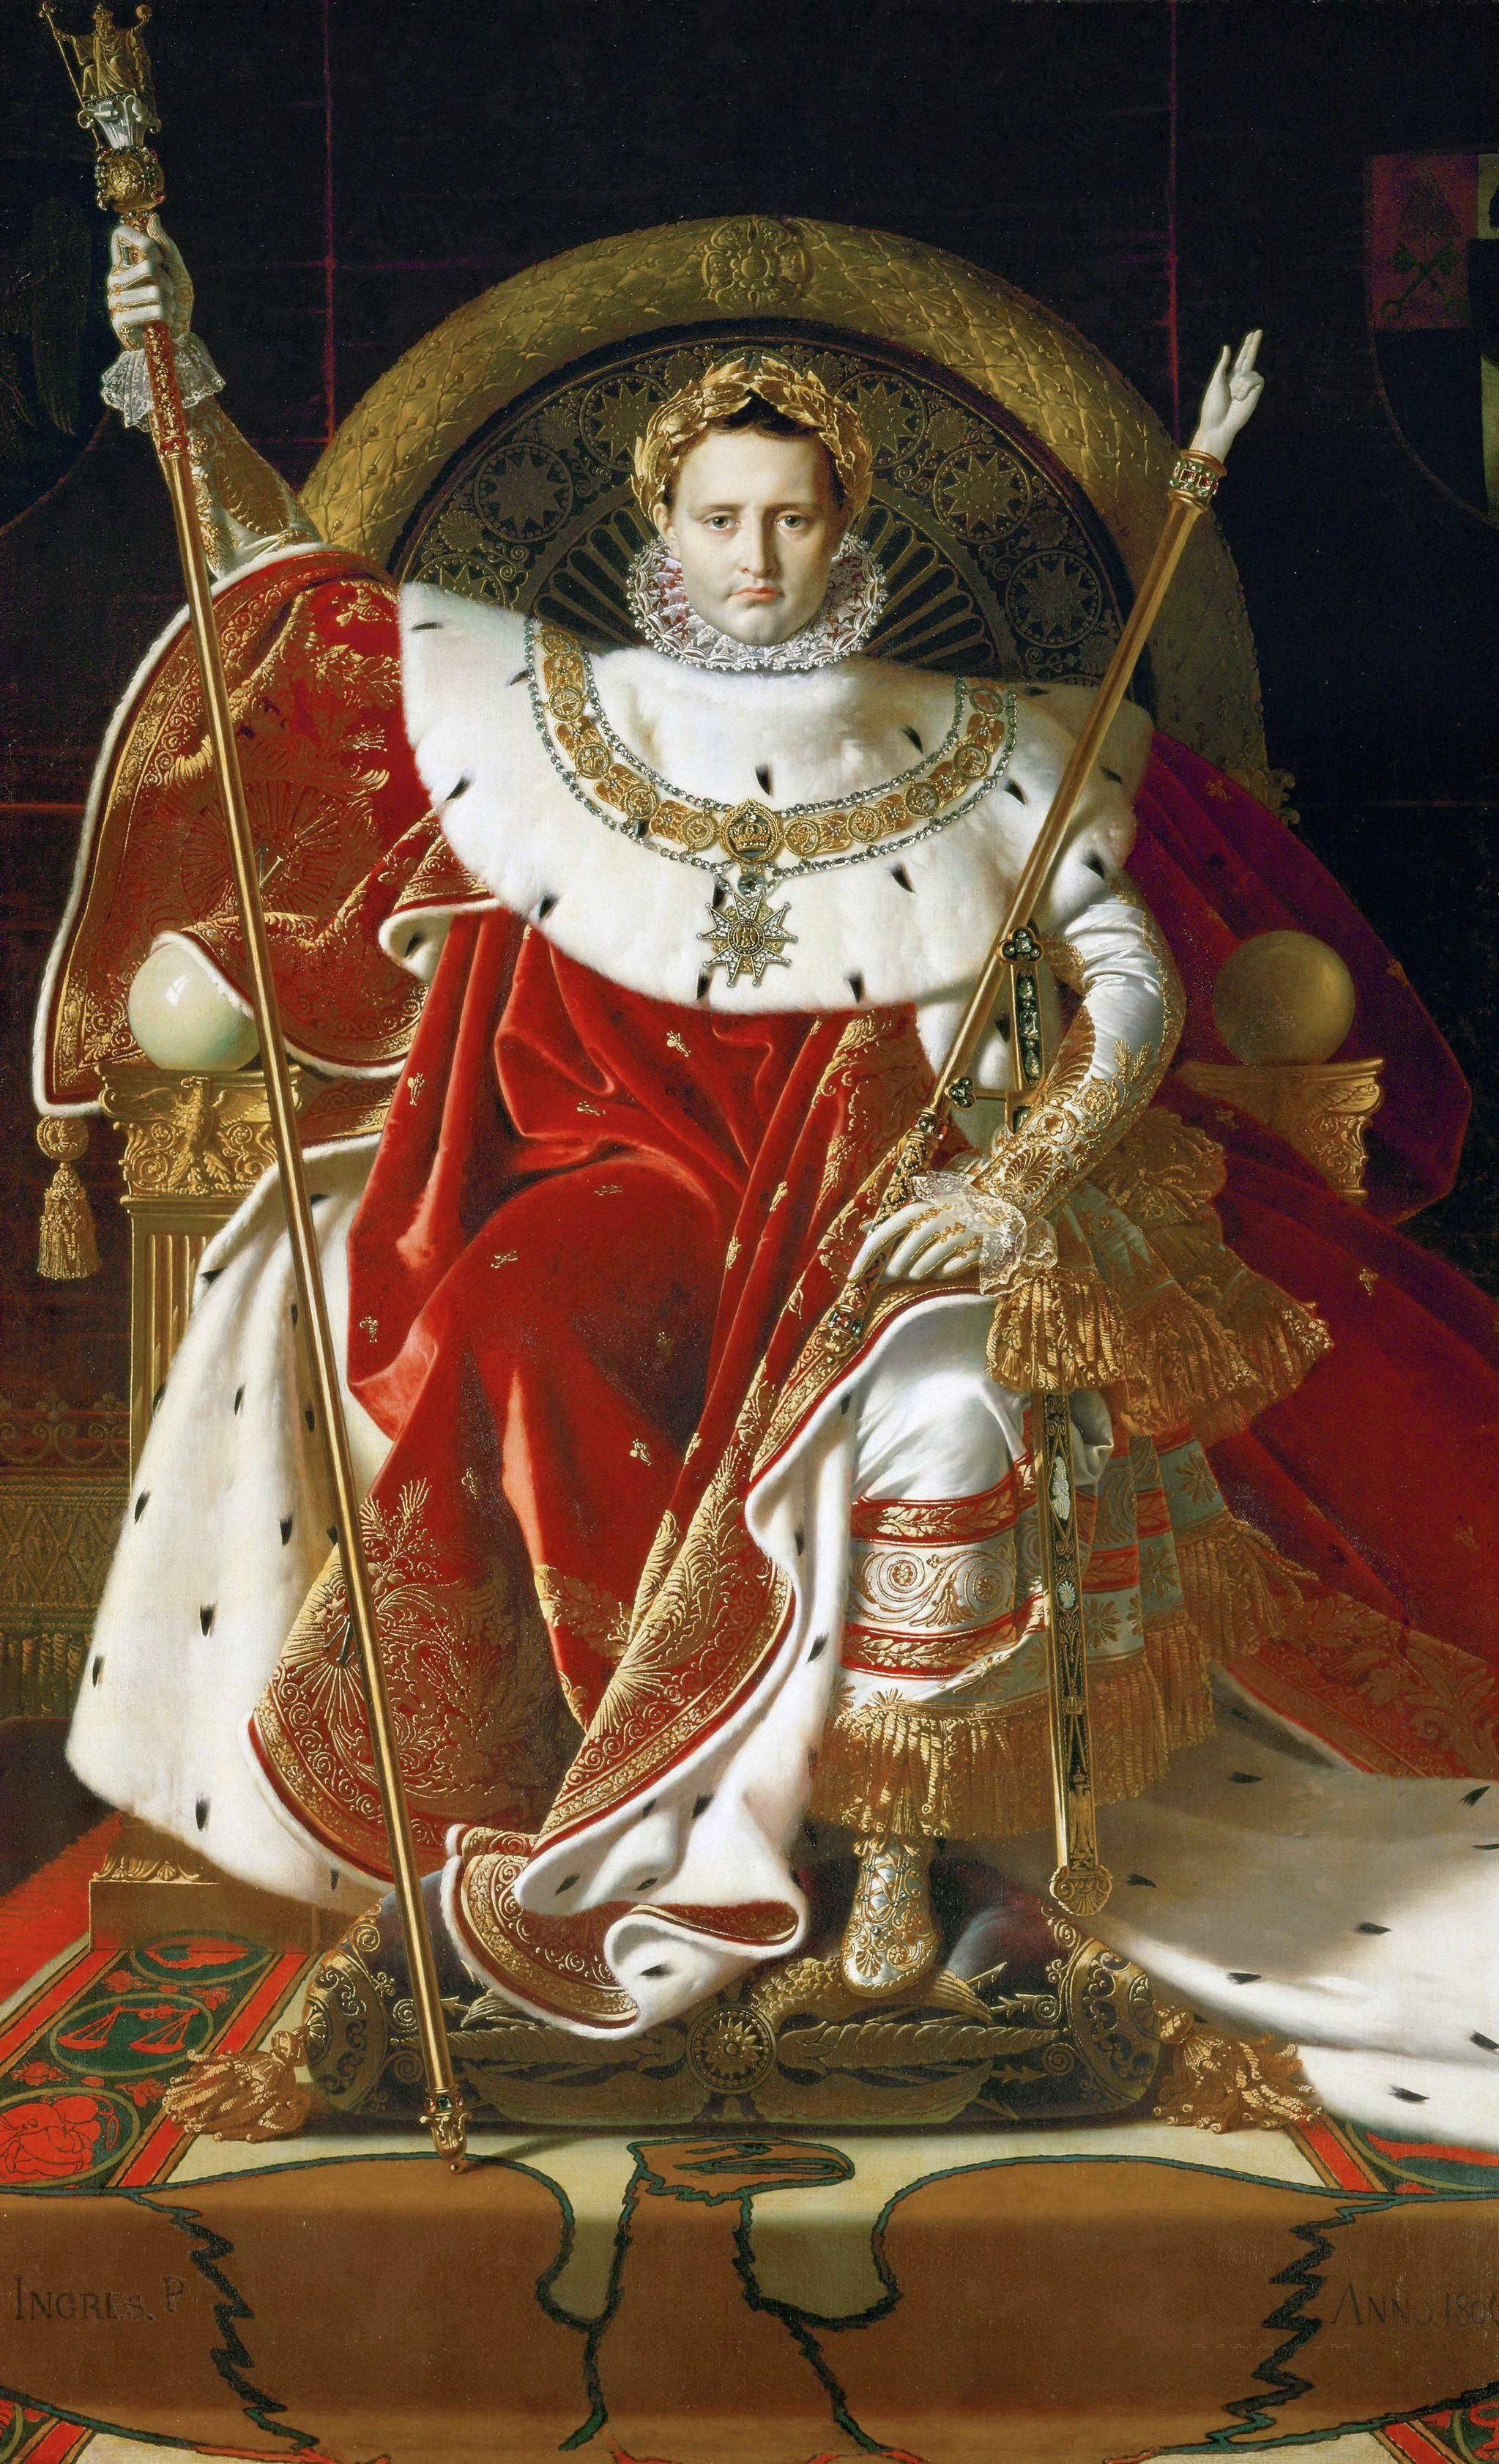 Napoleon on his Imperial throne. Jean Auguste Dominique Ingres (1780-1867).